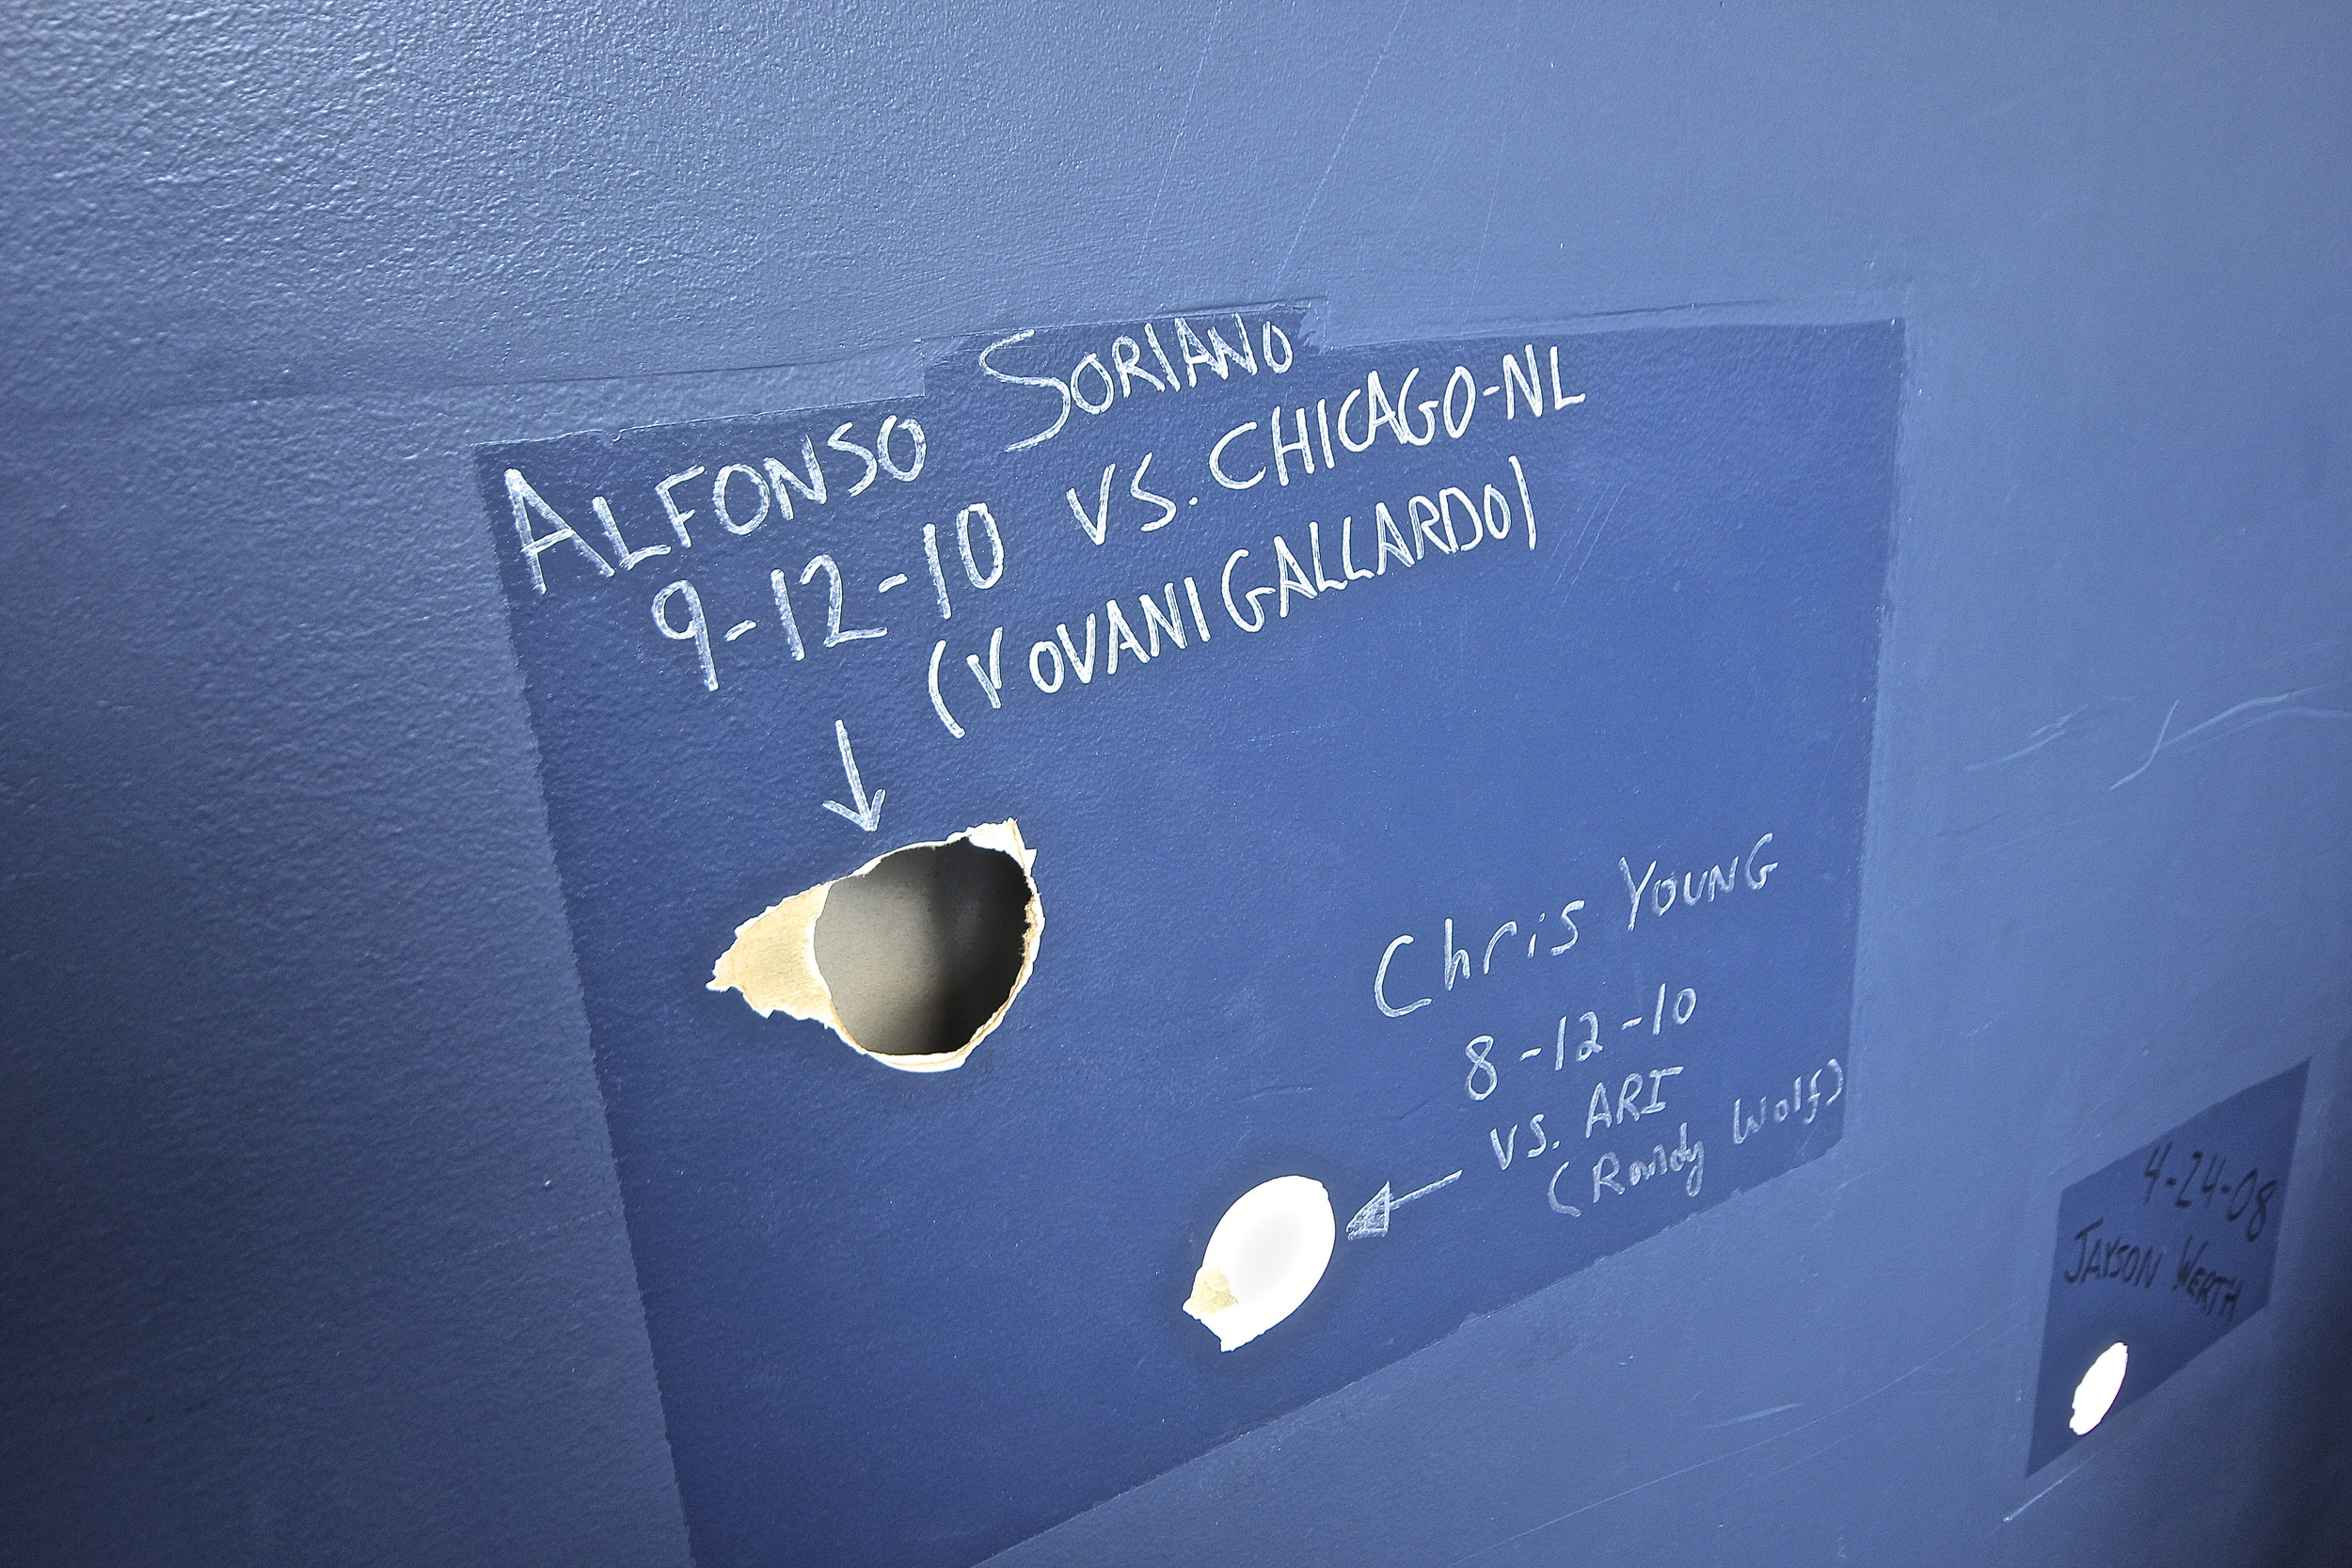 Foul ball holes in press box